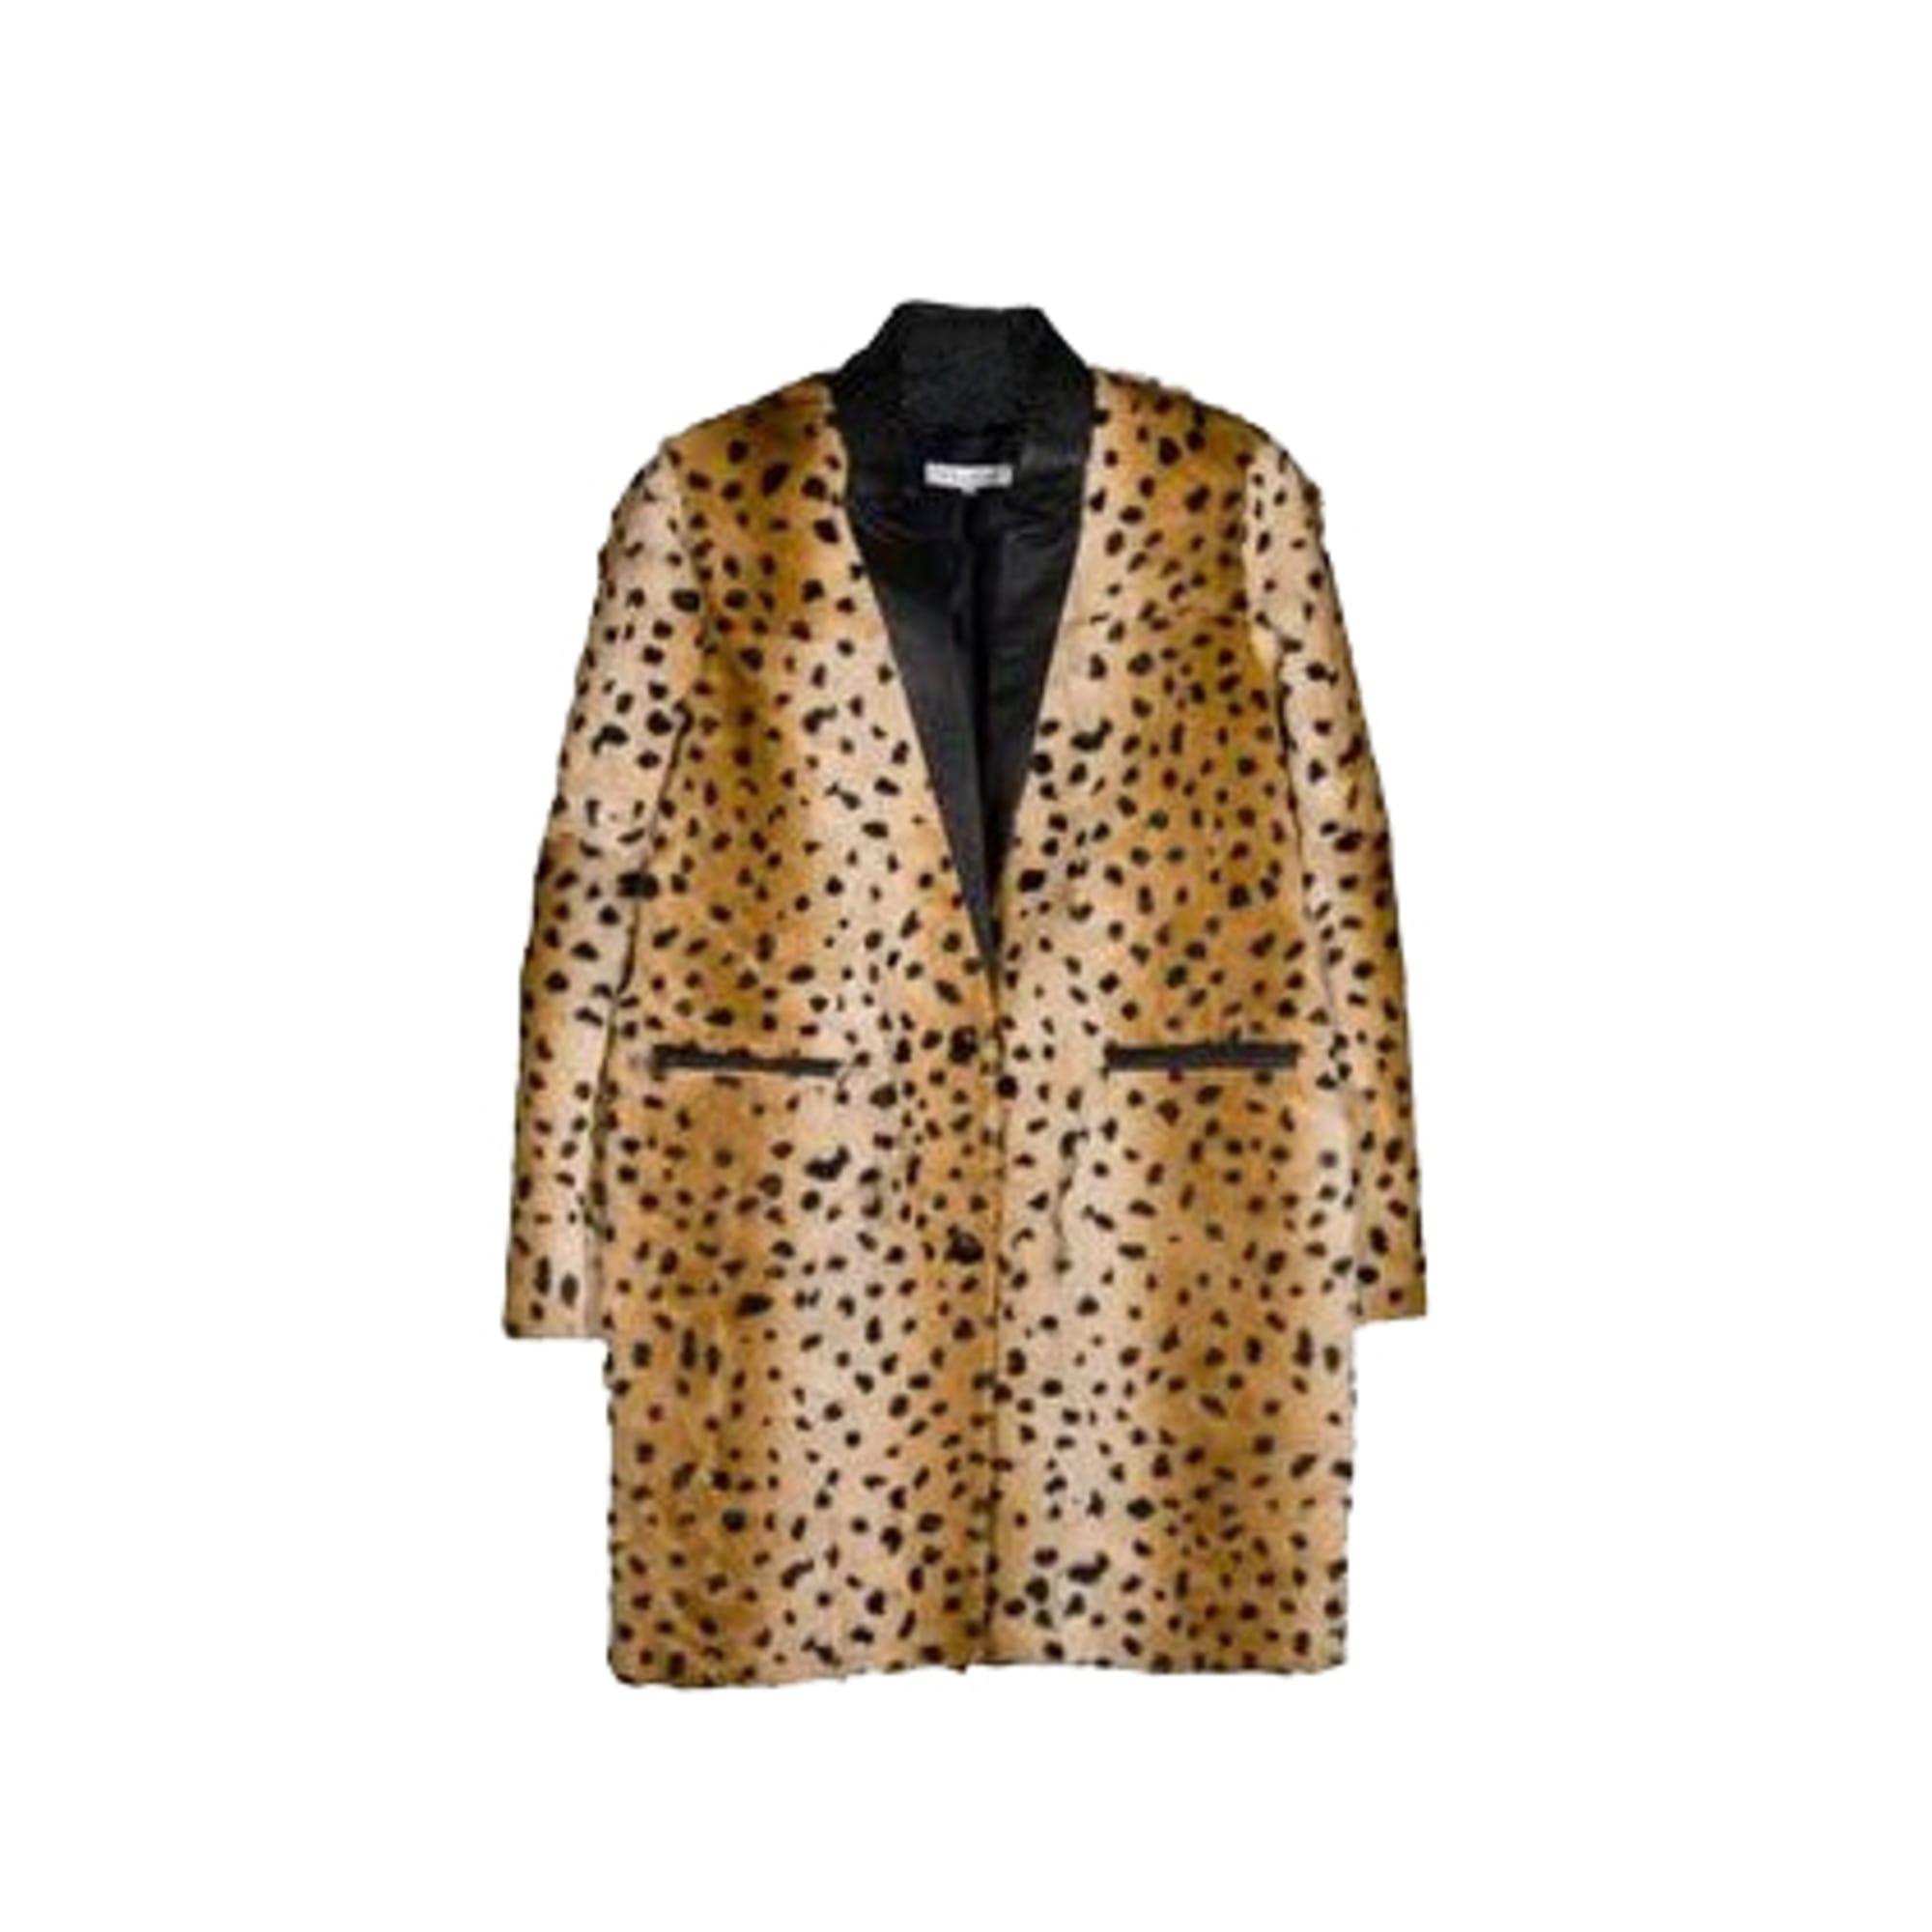 5a5b41041cb2 Manteau en cuir SANDRO Imprimés animaliers